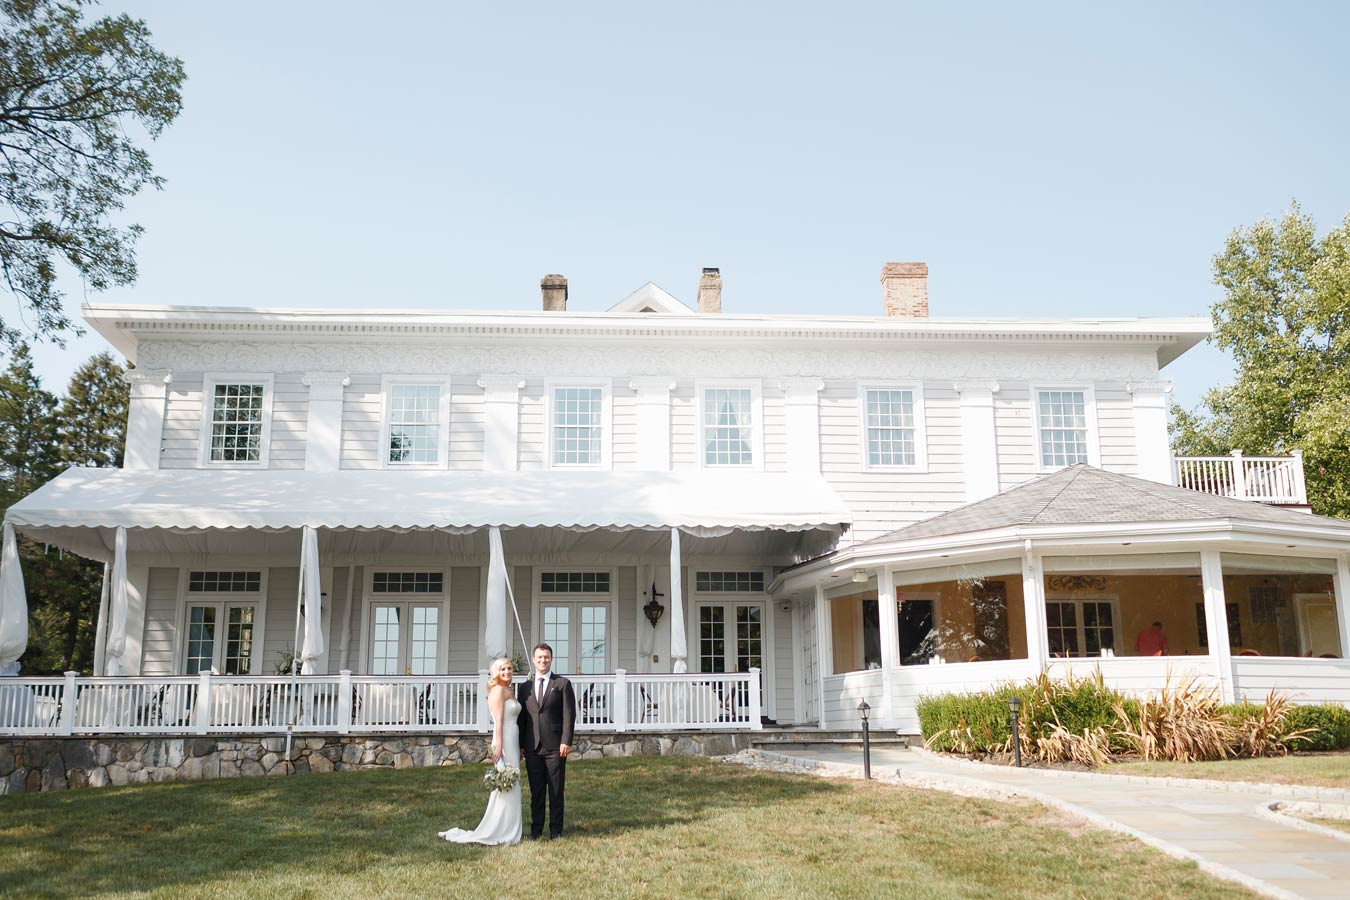 monterverde-oldtone-manor-westchester-wedding-photogrpher0014.jpg